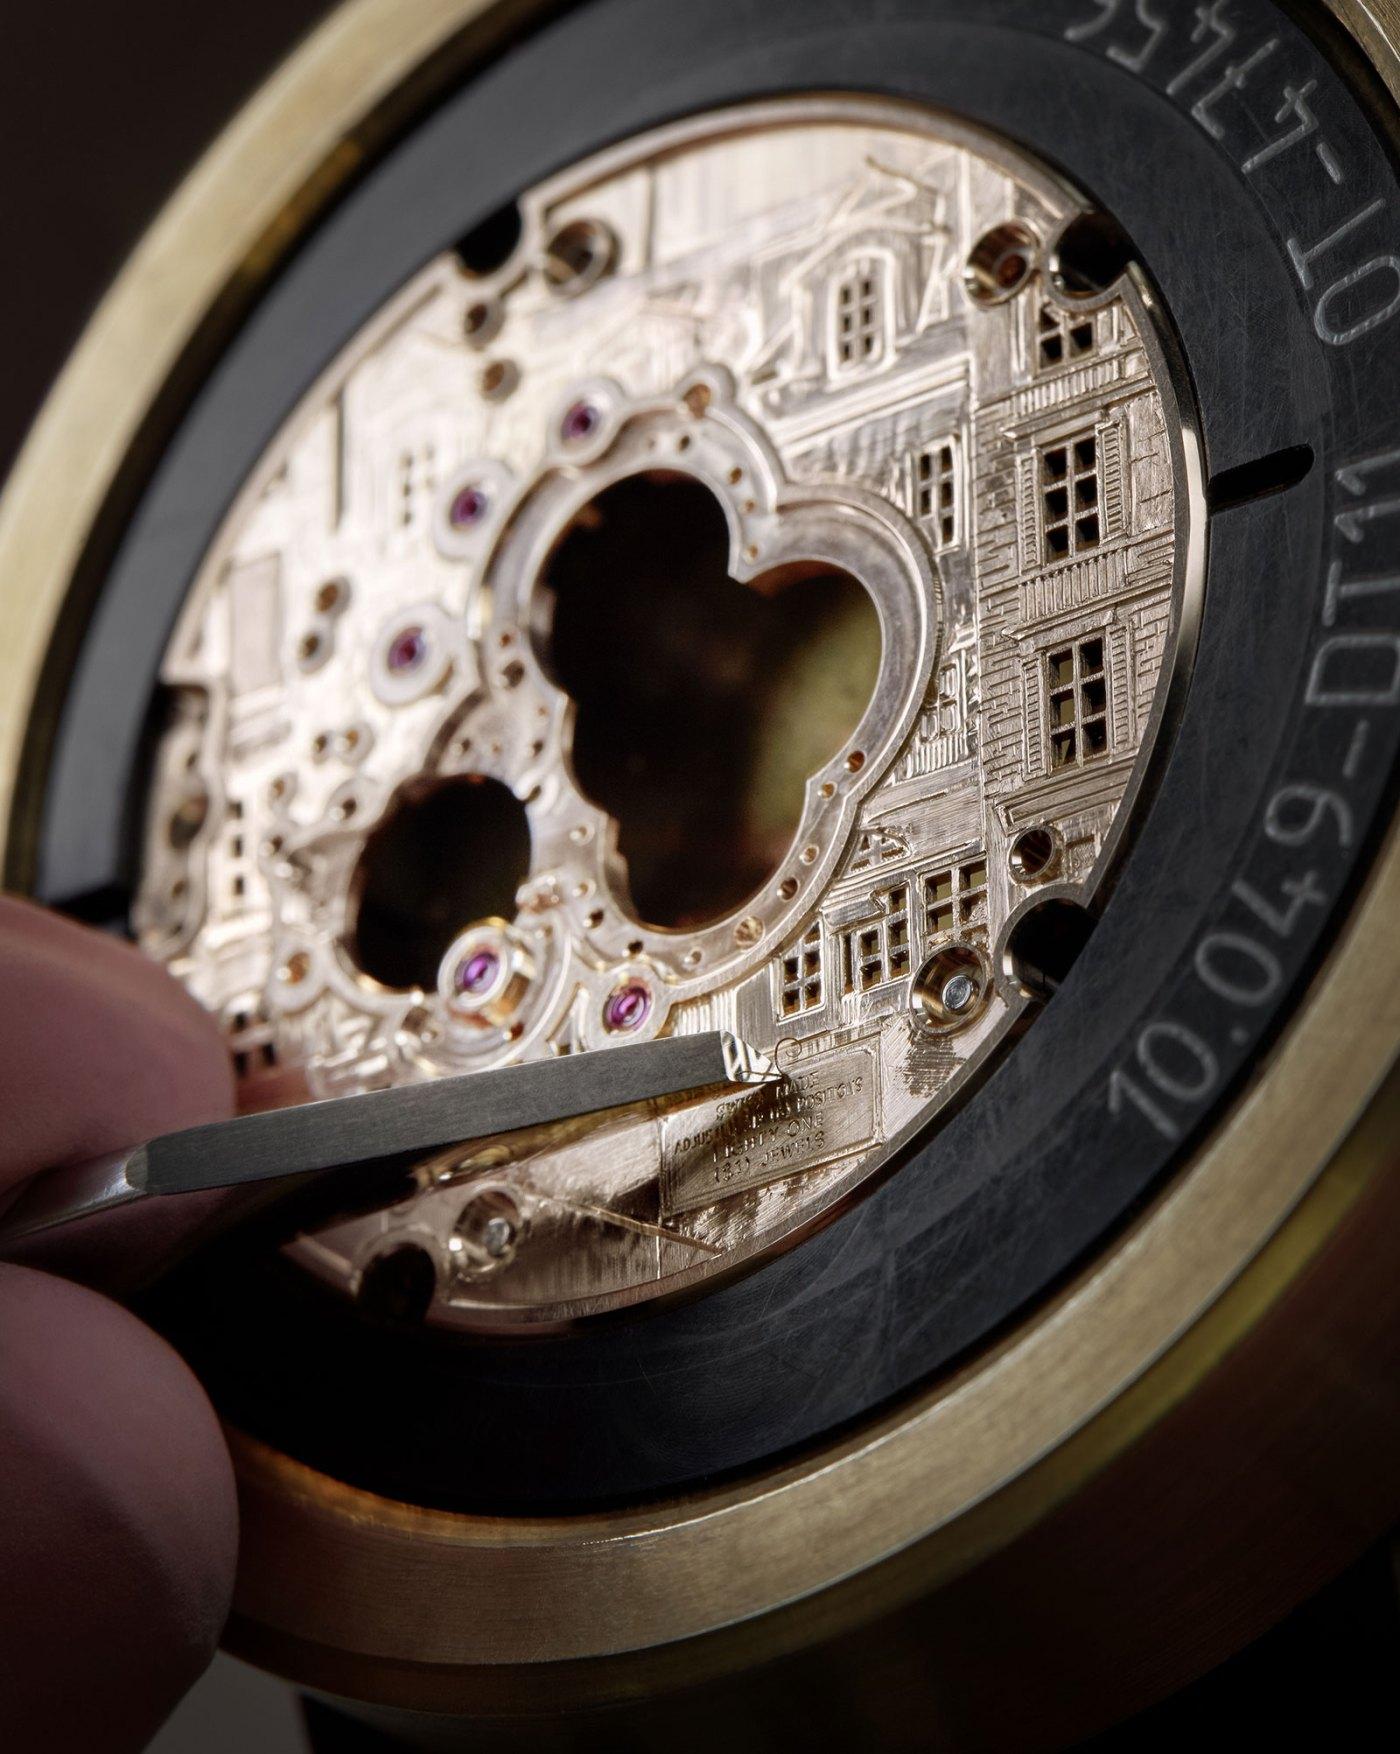 Breguet Classique Double Tourbillon 5345 Quai de l'Horloge hand engraving mainplate